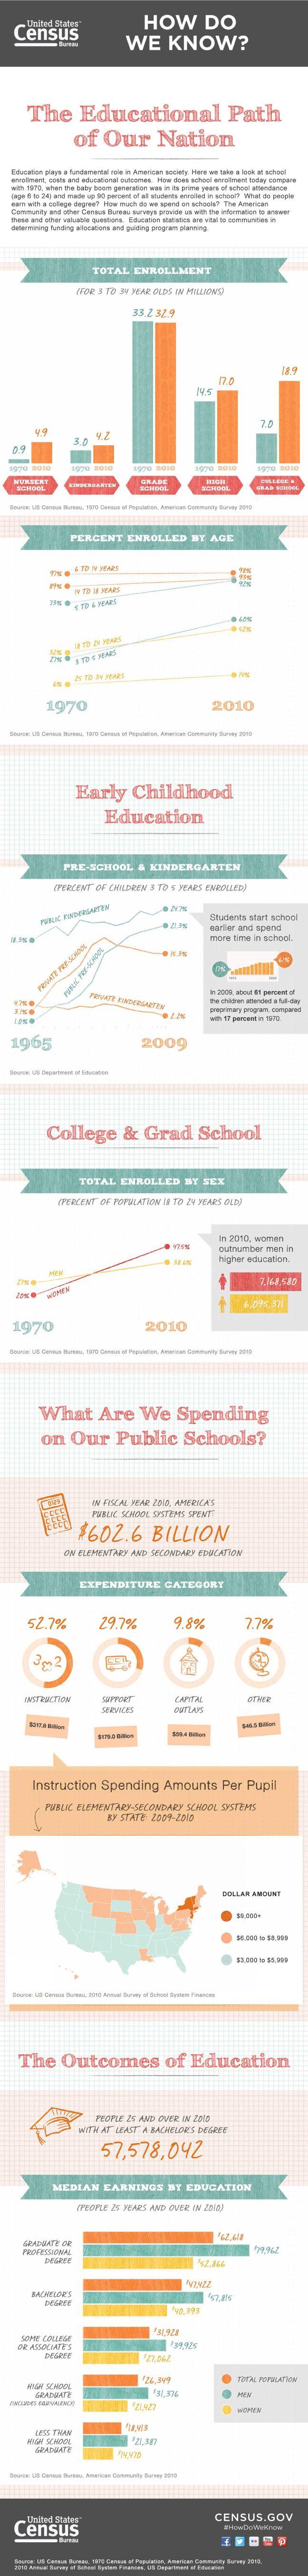 New data on public education released - No B.S. University http://www.NOBSU.com